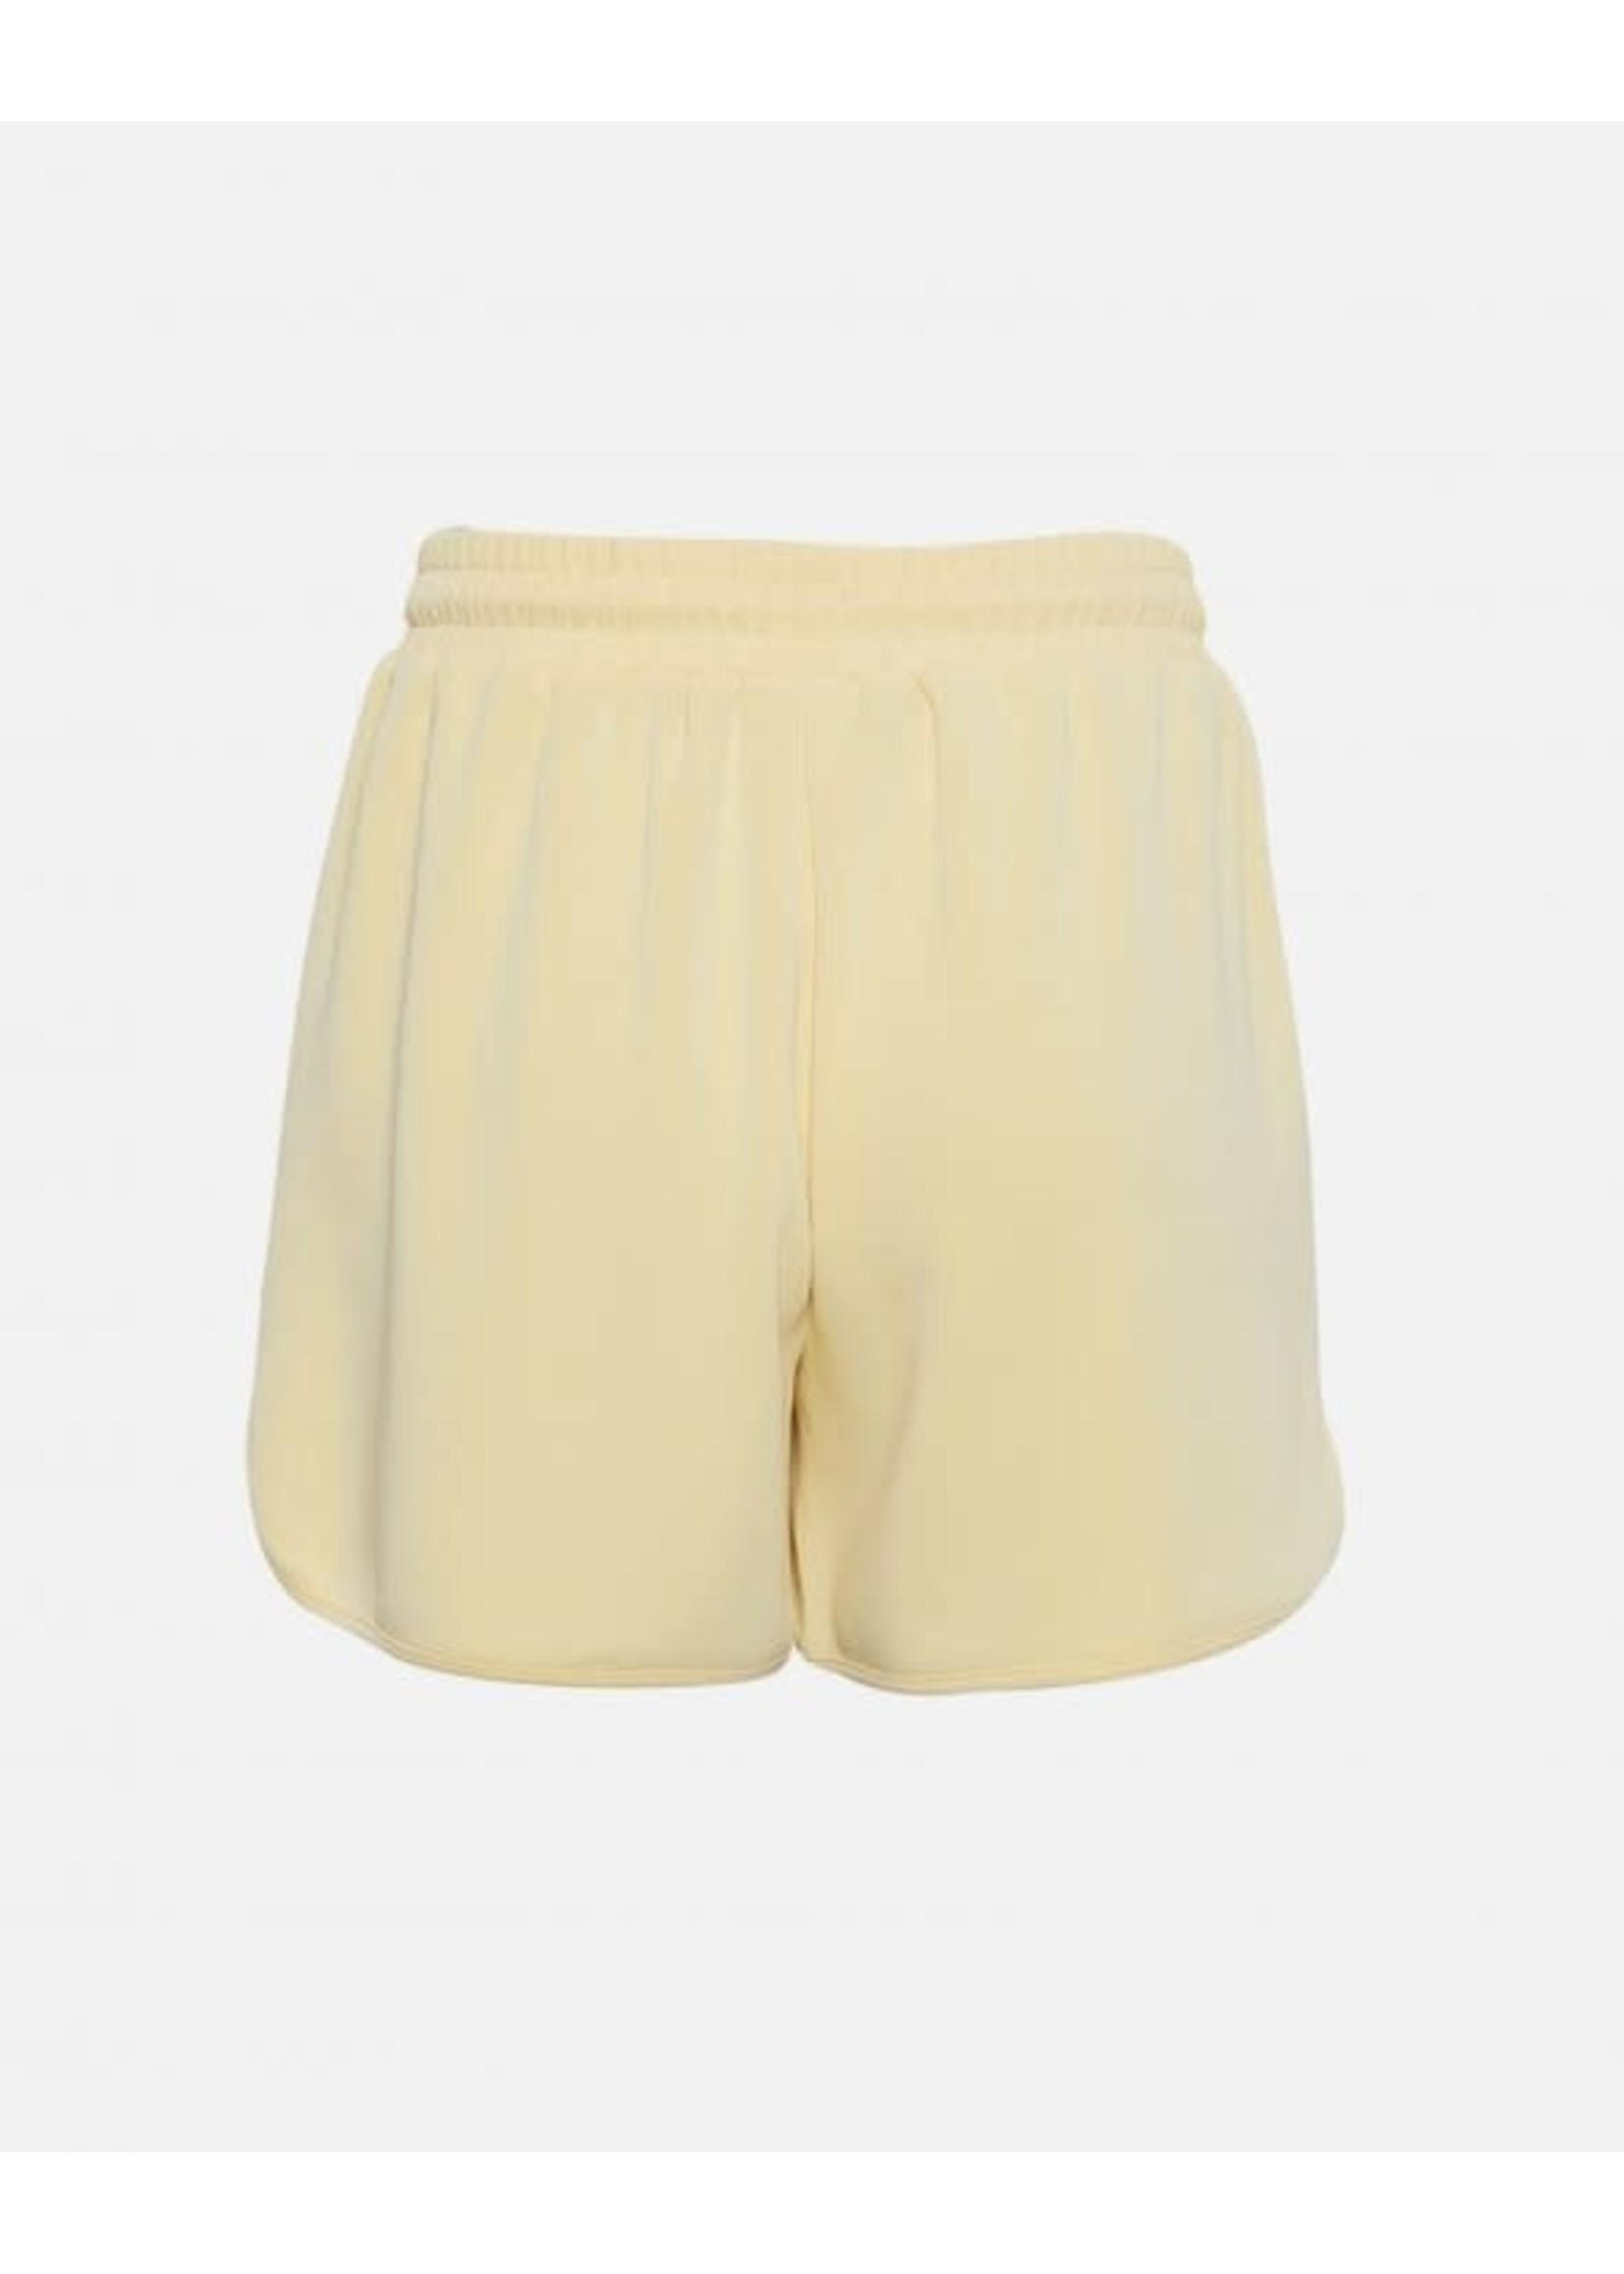 MSCH Terisa Merla shorts,pale banana